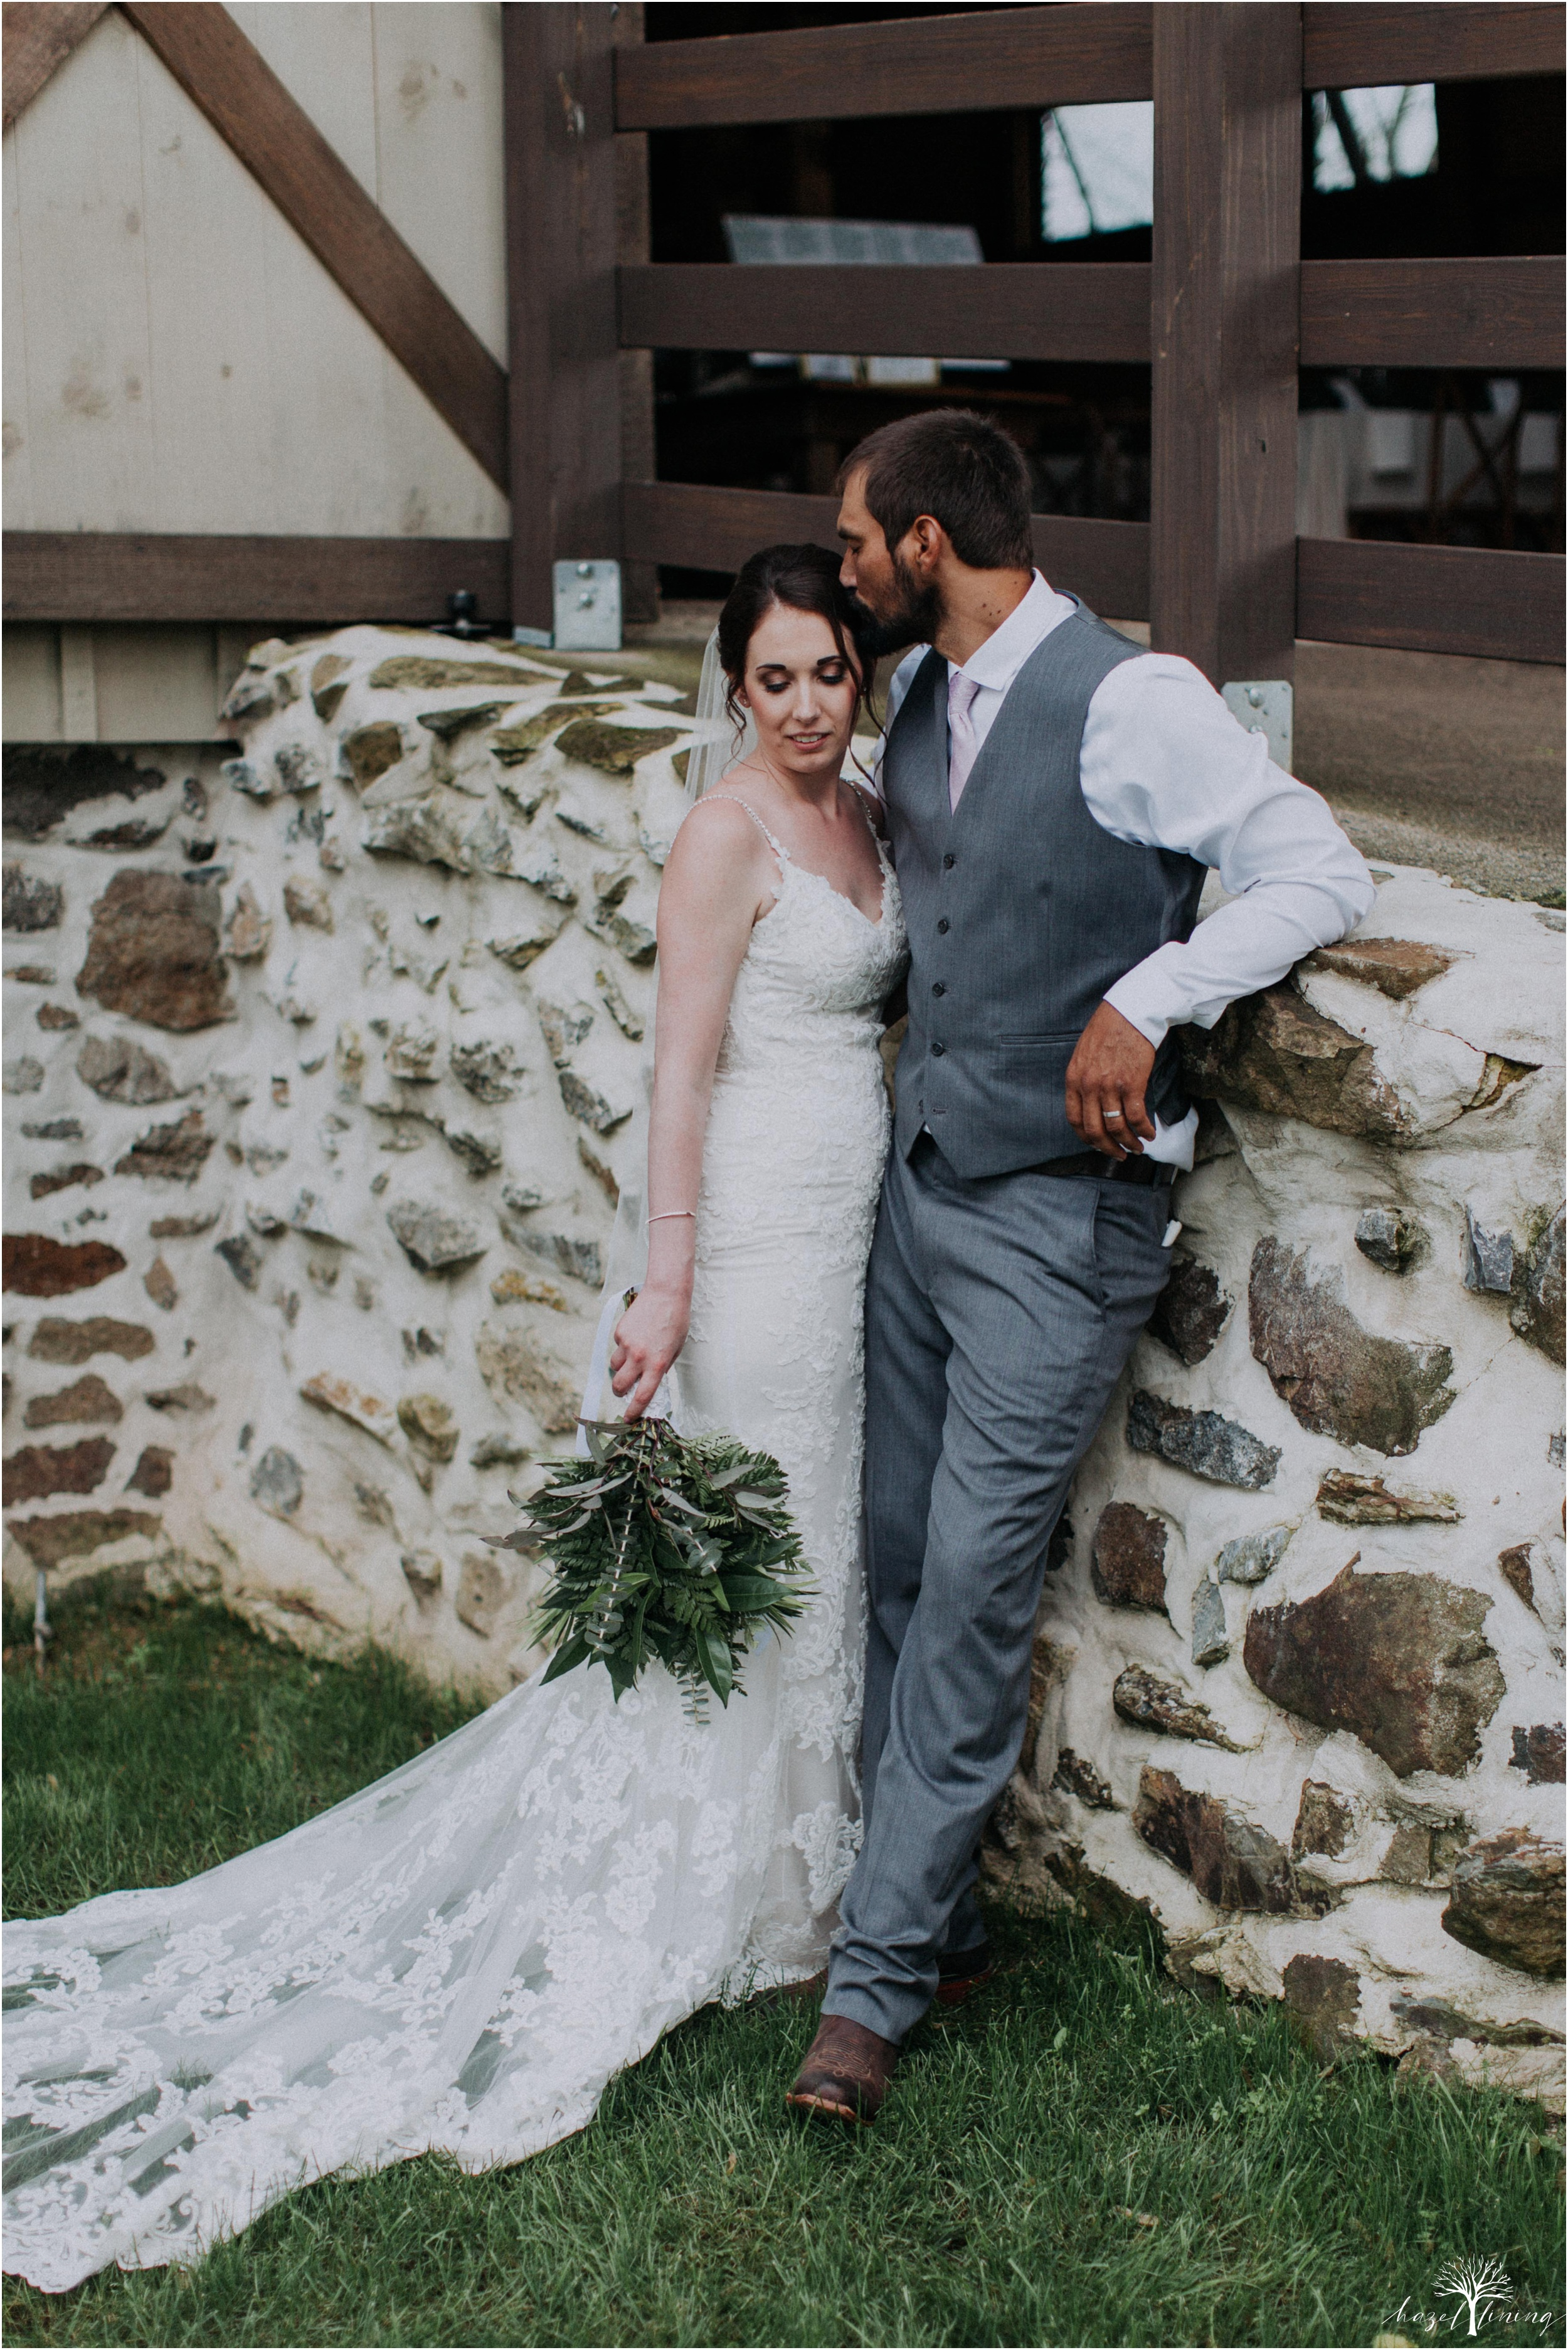 hazel-lining-travel-wedding-elopement-photography-lisa-landon-shoemaker-the-farm-bakery-and-events-bucks-county-quakertown-pennsylvania-summer-country-outdoor-farm-wedding_0102.jpg